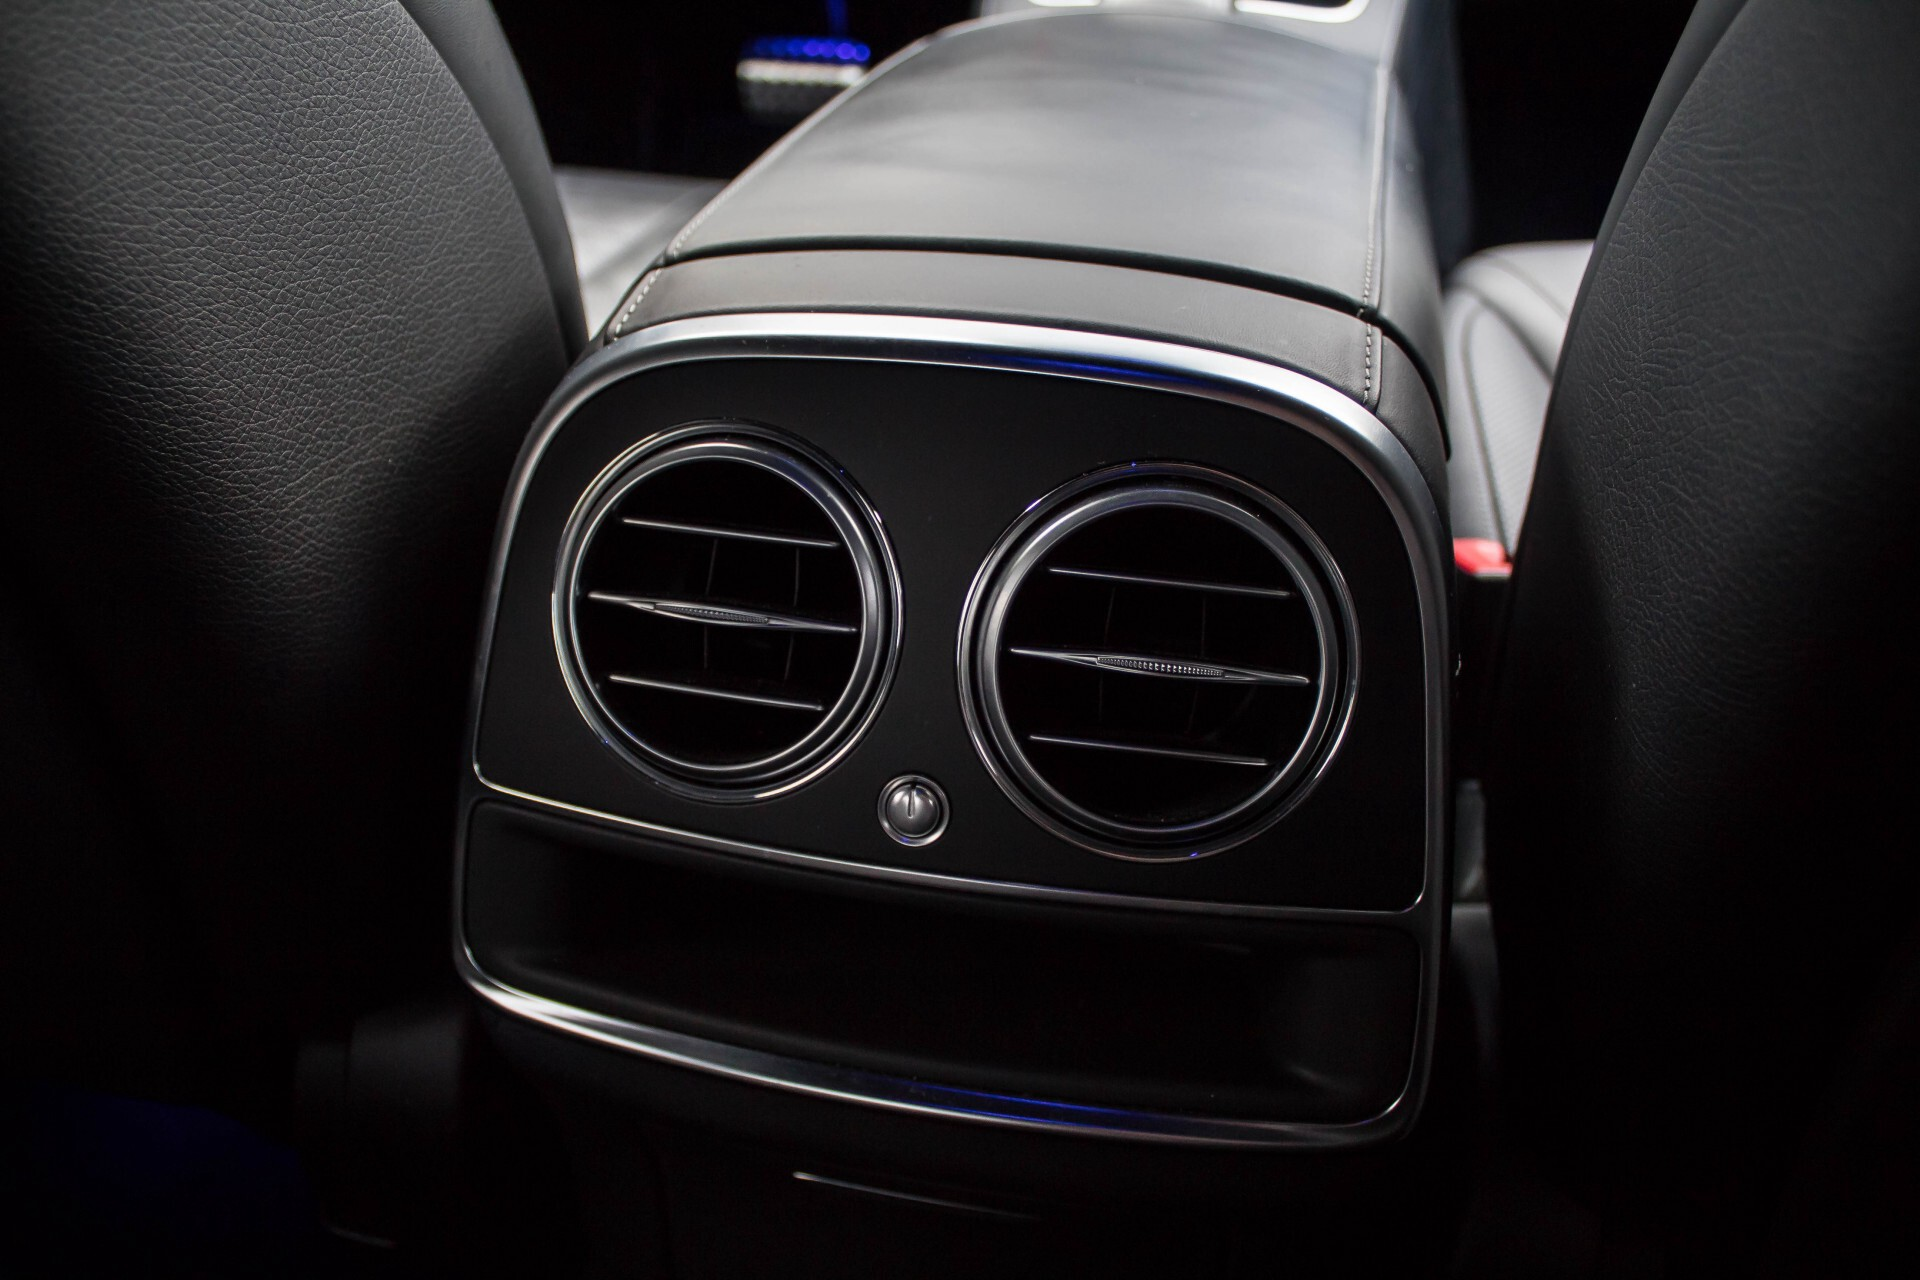 Mercedes-Benz S-Klasse 350 BlueTEC 63 AMG Panorama/Distronic/Keyless/Massage/Burmester Aut7 Foto 33